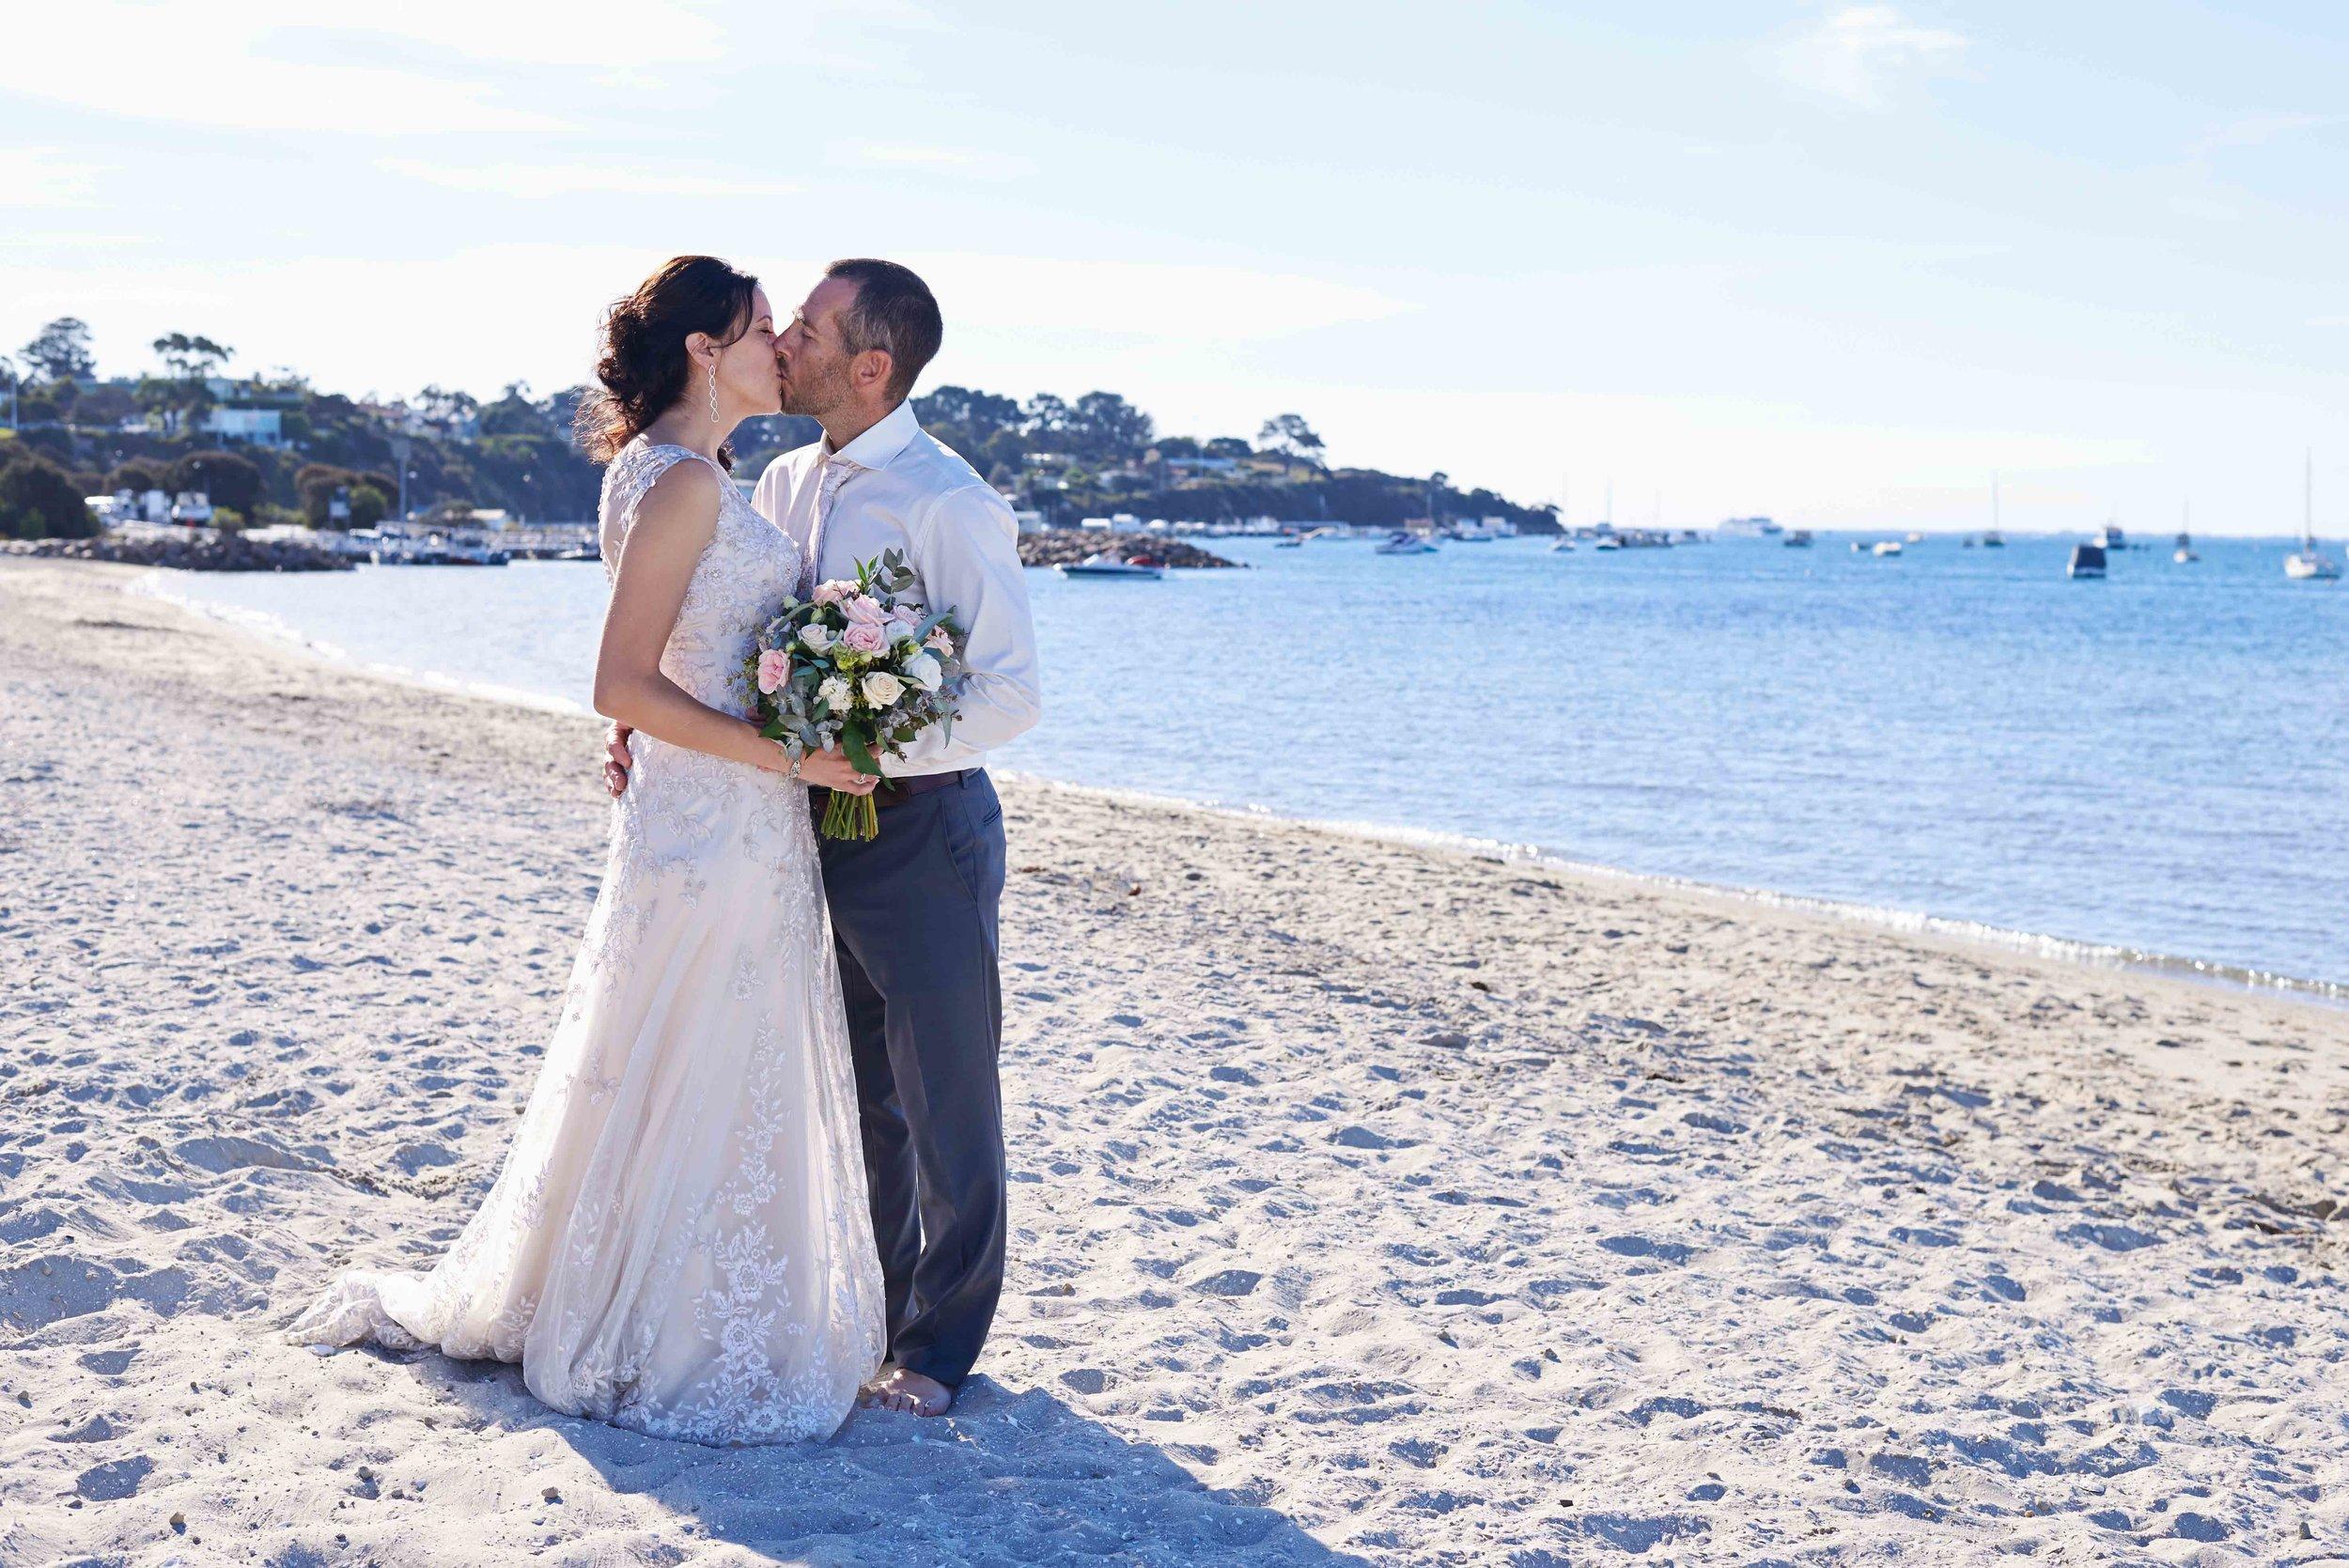 sorrento-wedding-photography-all-smiles-marissa-jade-photography-160.jpg